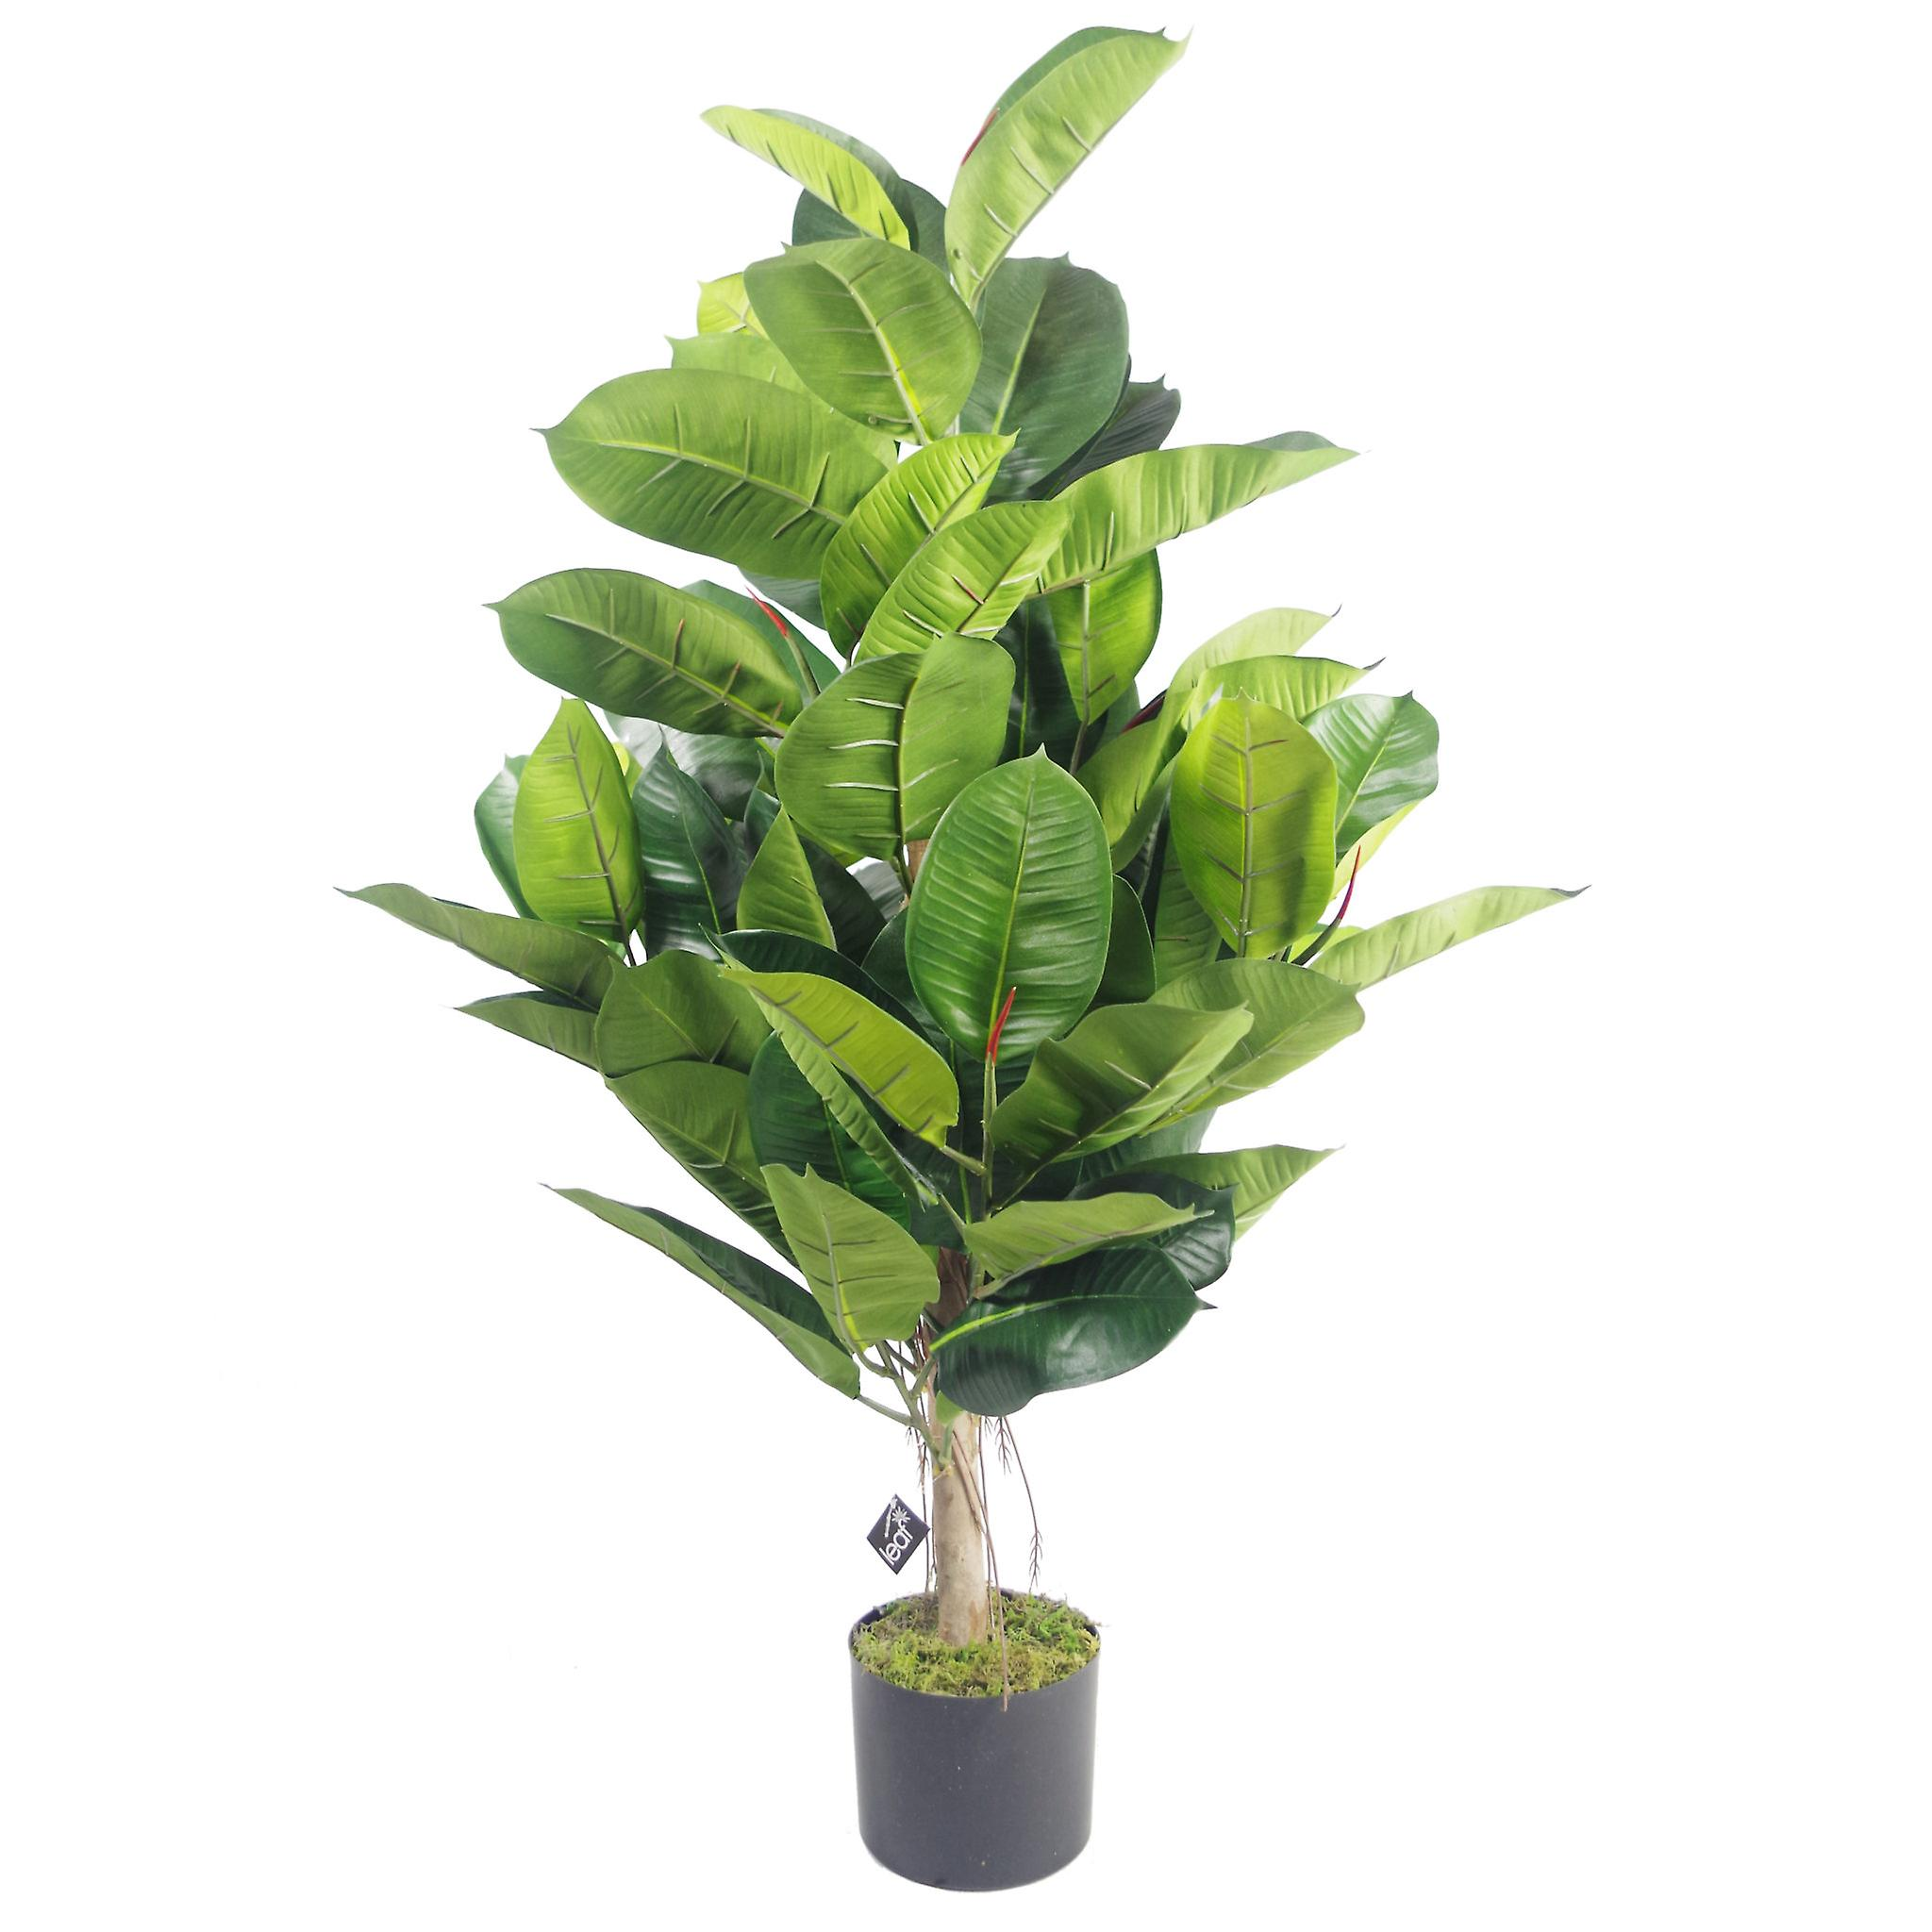 90cm Large Rubber Plant Artificial Tree Ficus Elastica